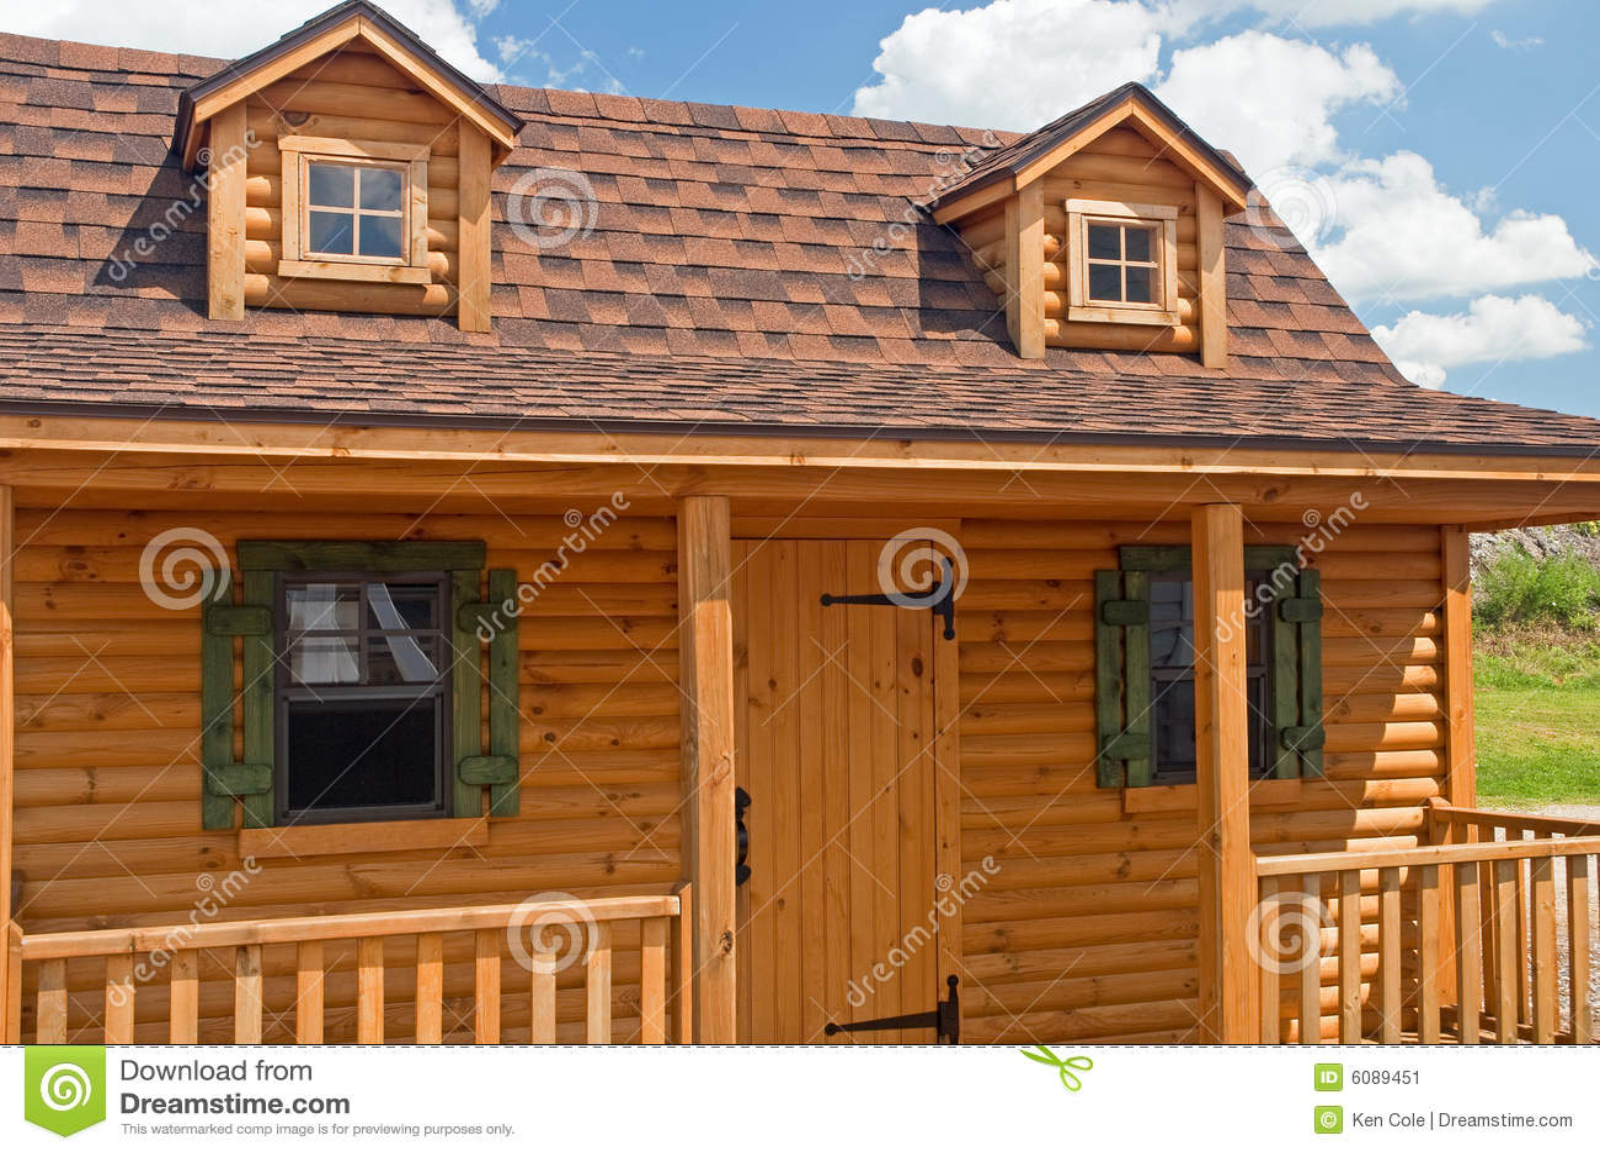 Rustic Log Cabin stock image. Image of doorway, gable - 6089451 on log home pergola designs, log home roof designs, log home window designs, log home carports, log home patio designs, log home cornice designs,